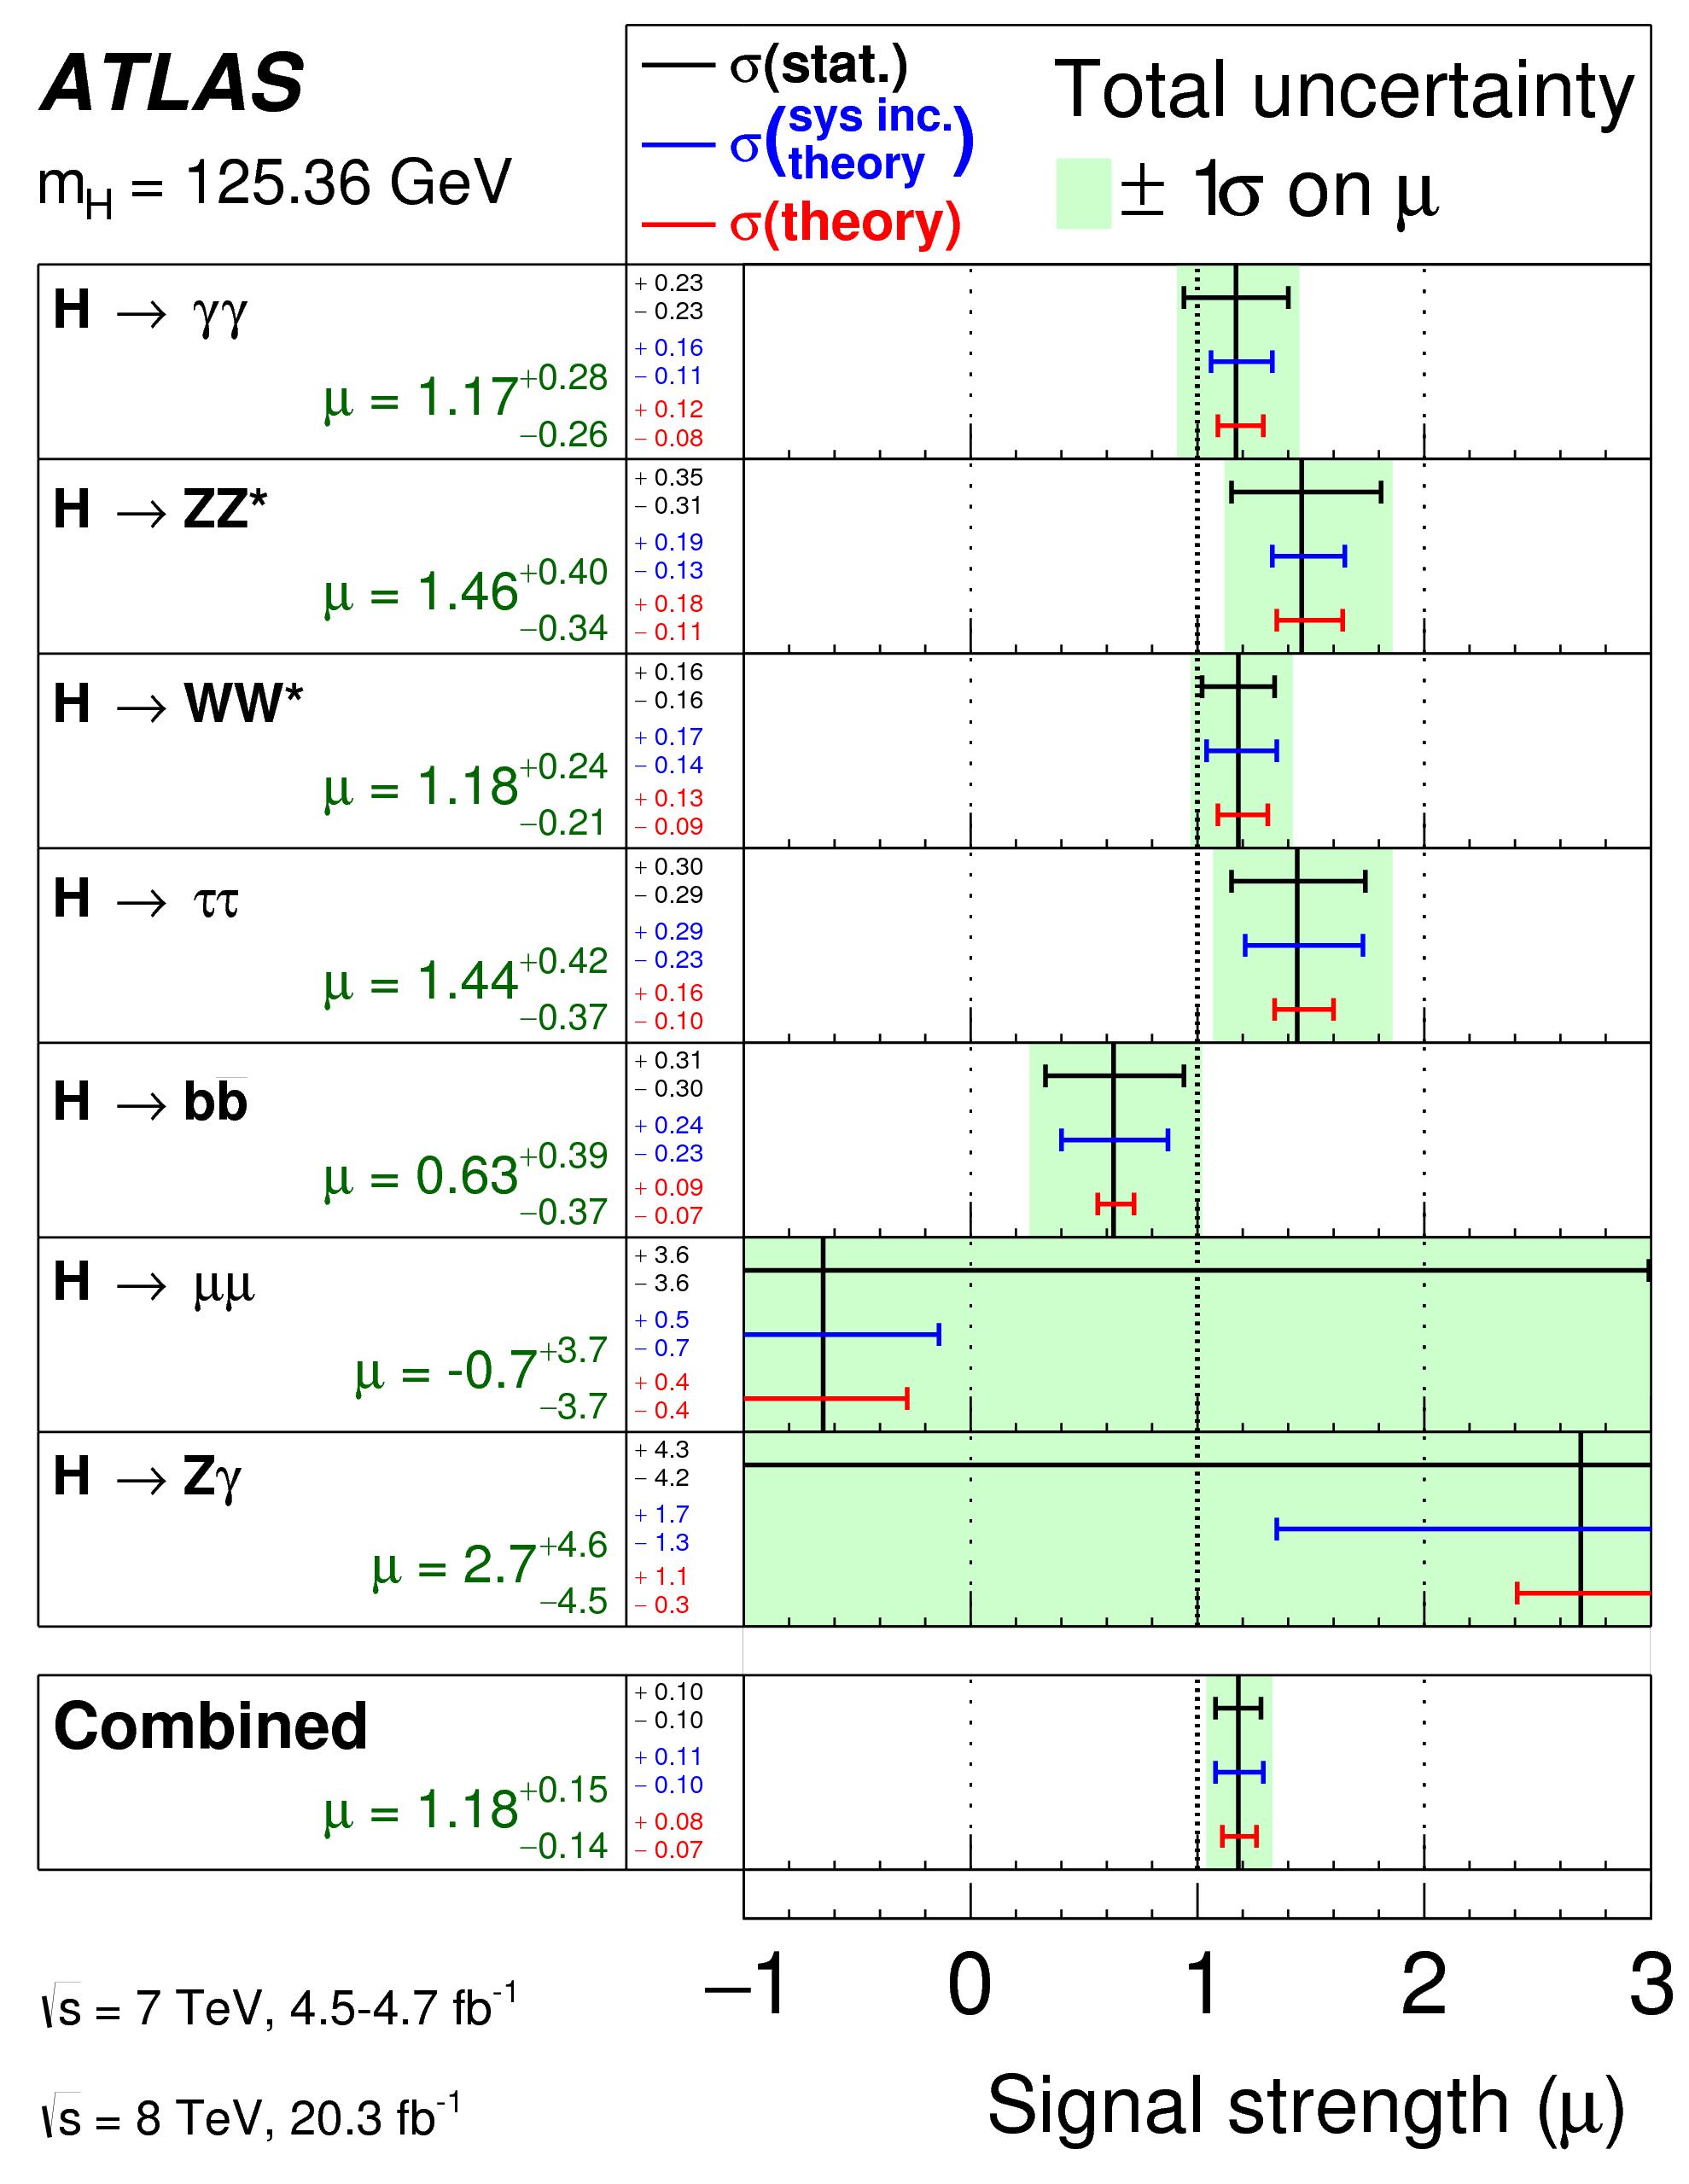 https://atlas.web.cern.ch/Atlas/GROUPS/PHYSICS/CombinedSummaryPlots/HIGGS/ATLAS_HIGGS3810_mu_Summary/ATLAS_HIGGS3810_mu_Summary.png